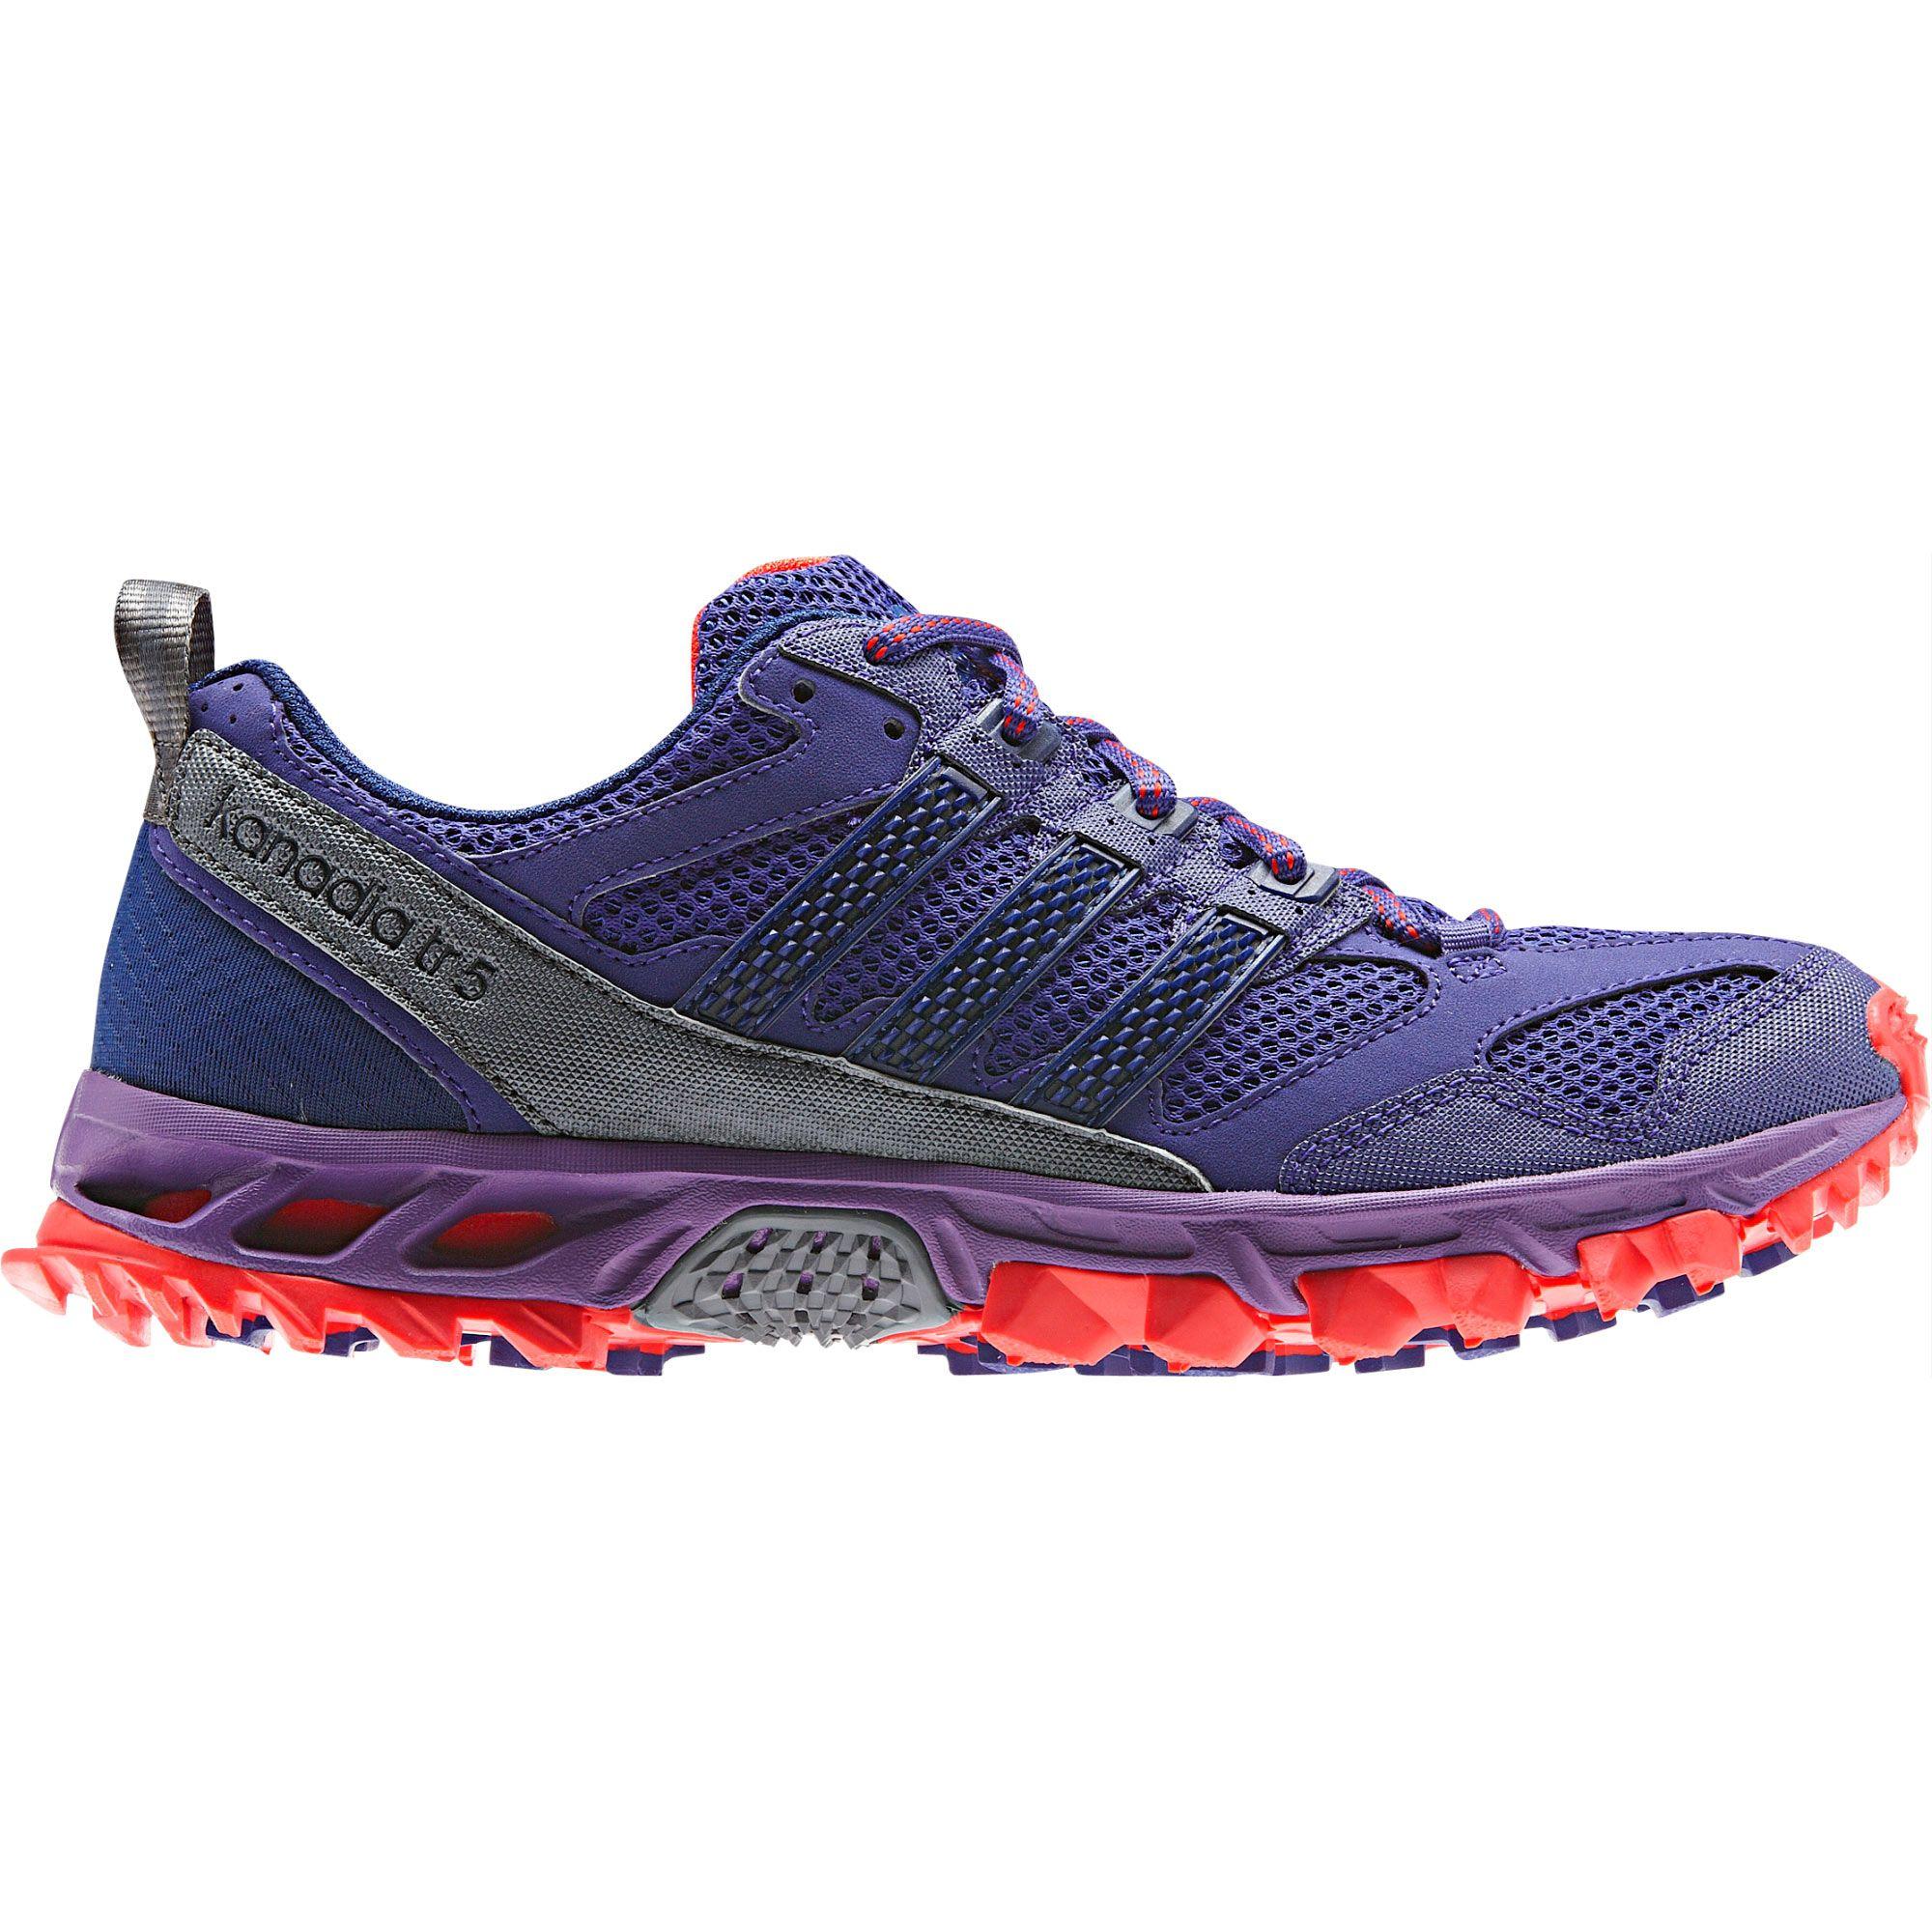 e998a6d28ee4 adidas Women s Kanadia 5 Trail Shoes